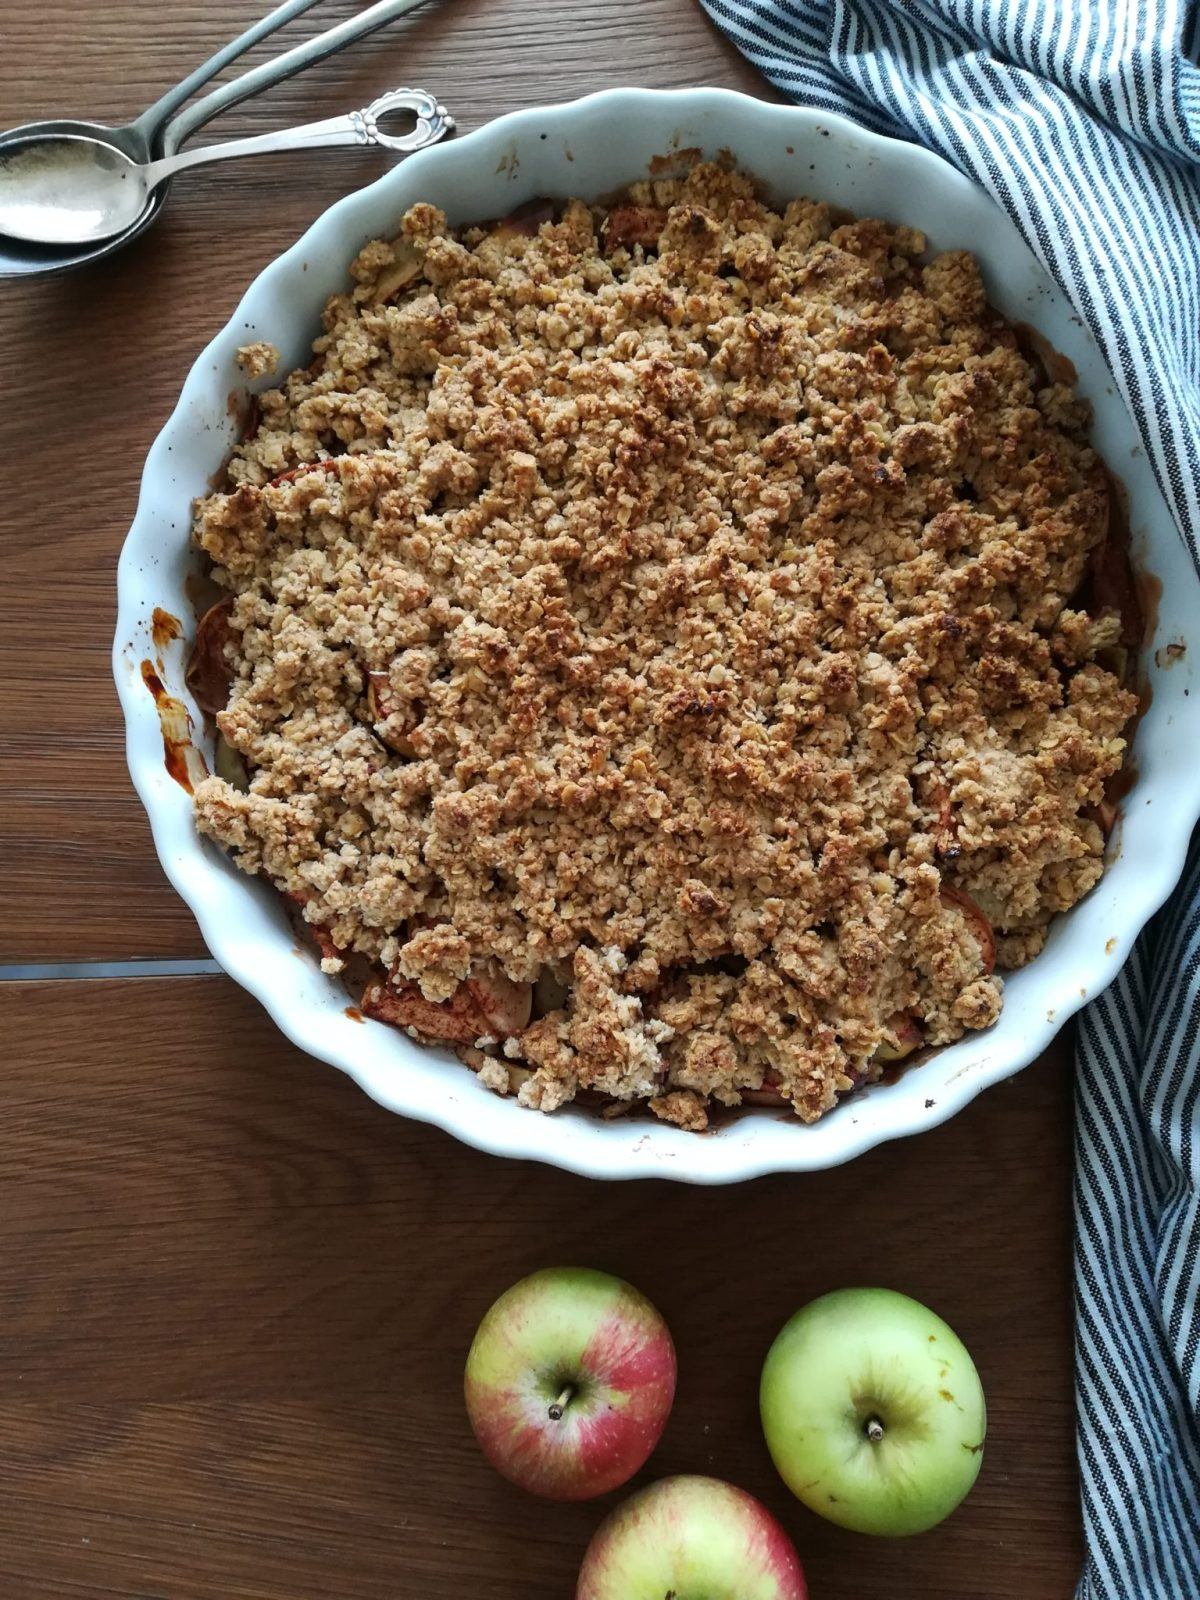 Vegansk æblecrumble med kanel og kardemomme